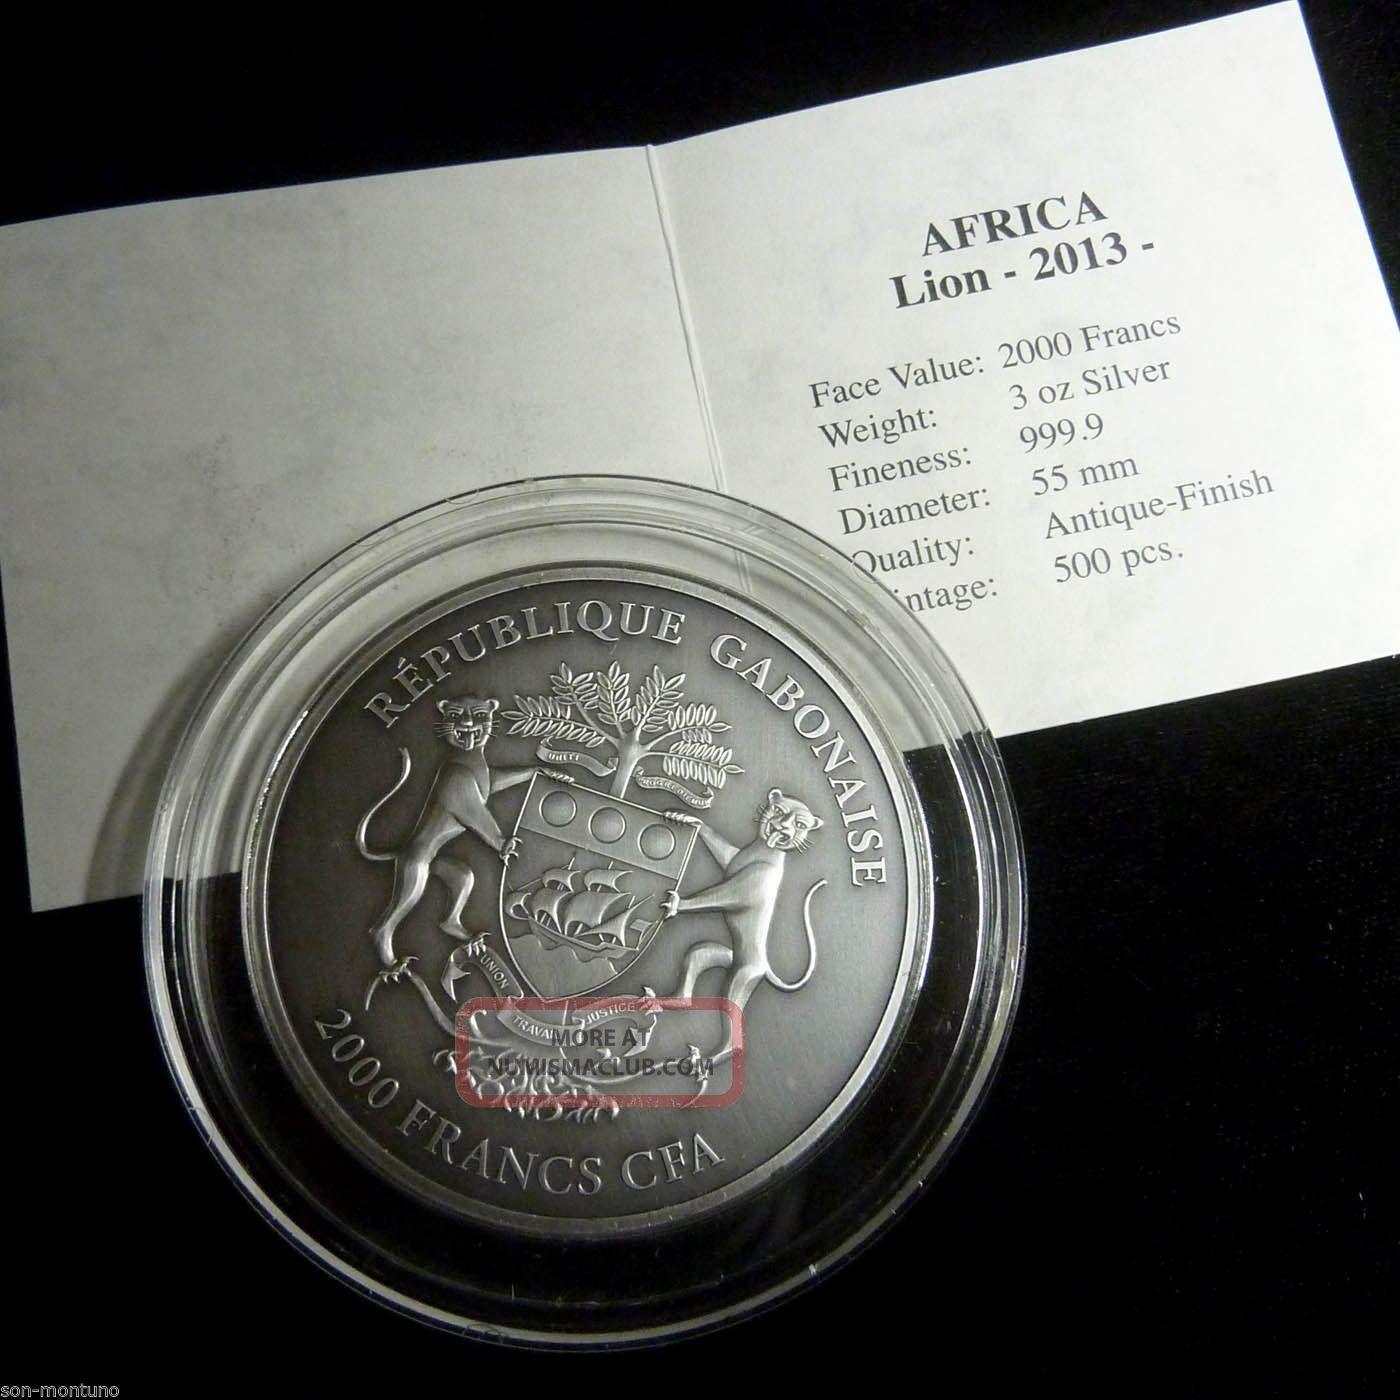 BABY ELEPHANTS 3 Silver Ounces Gabon 2000 Francs Antique Finish 3 Oz Coin 2013